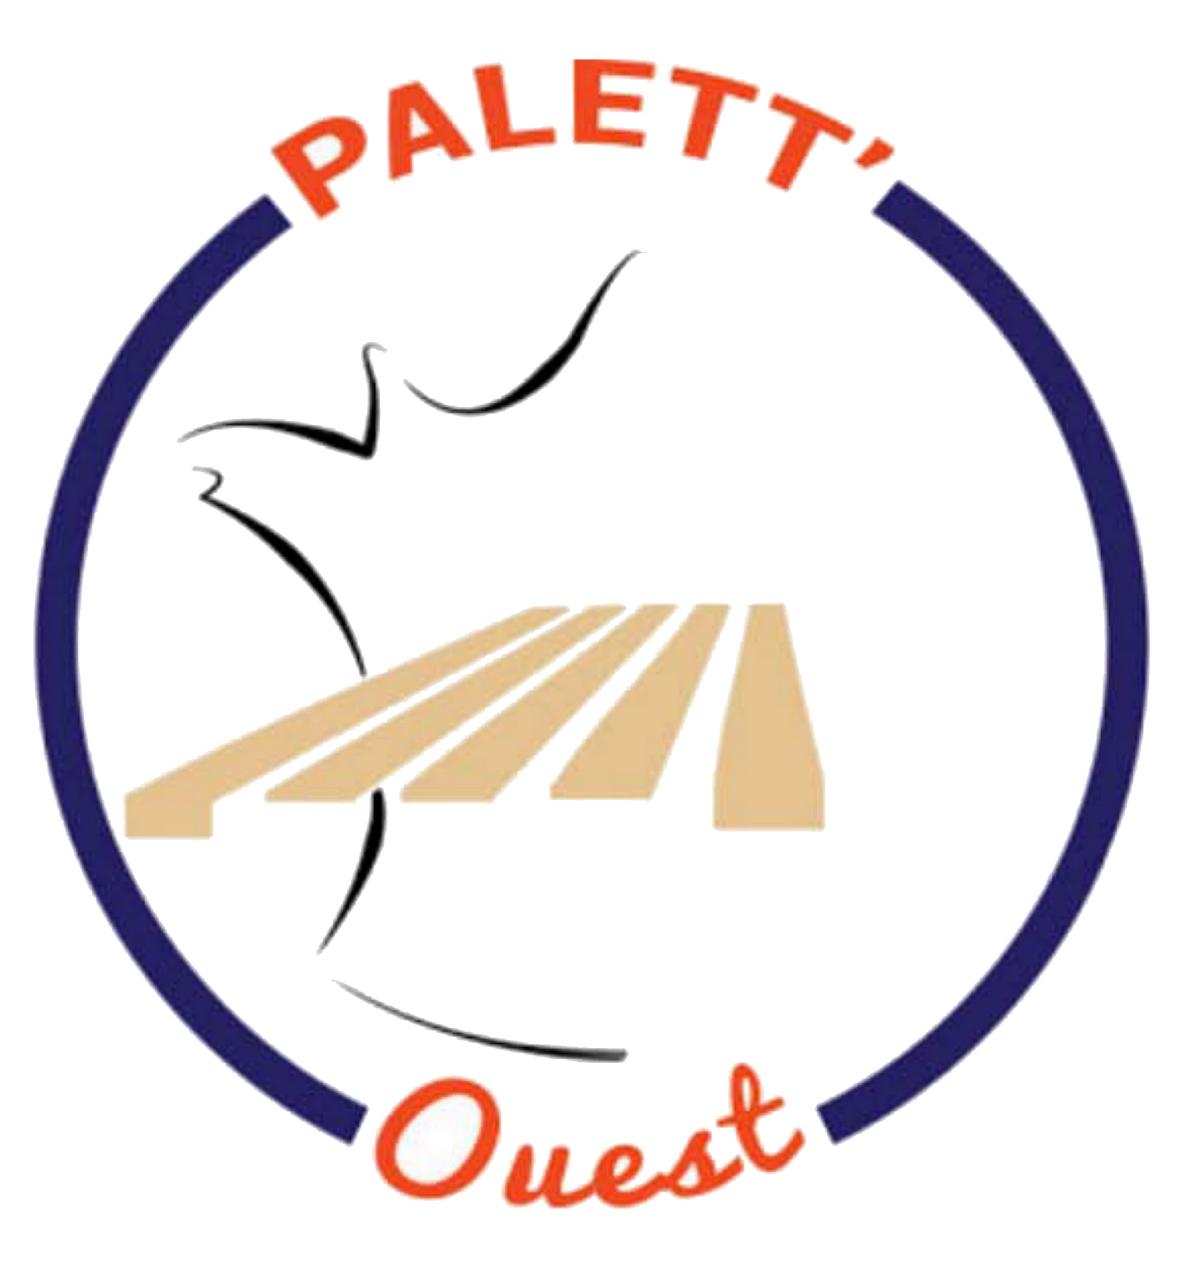 Palett_Ouest bd.png